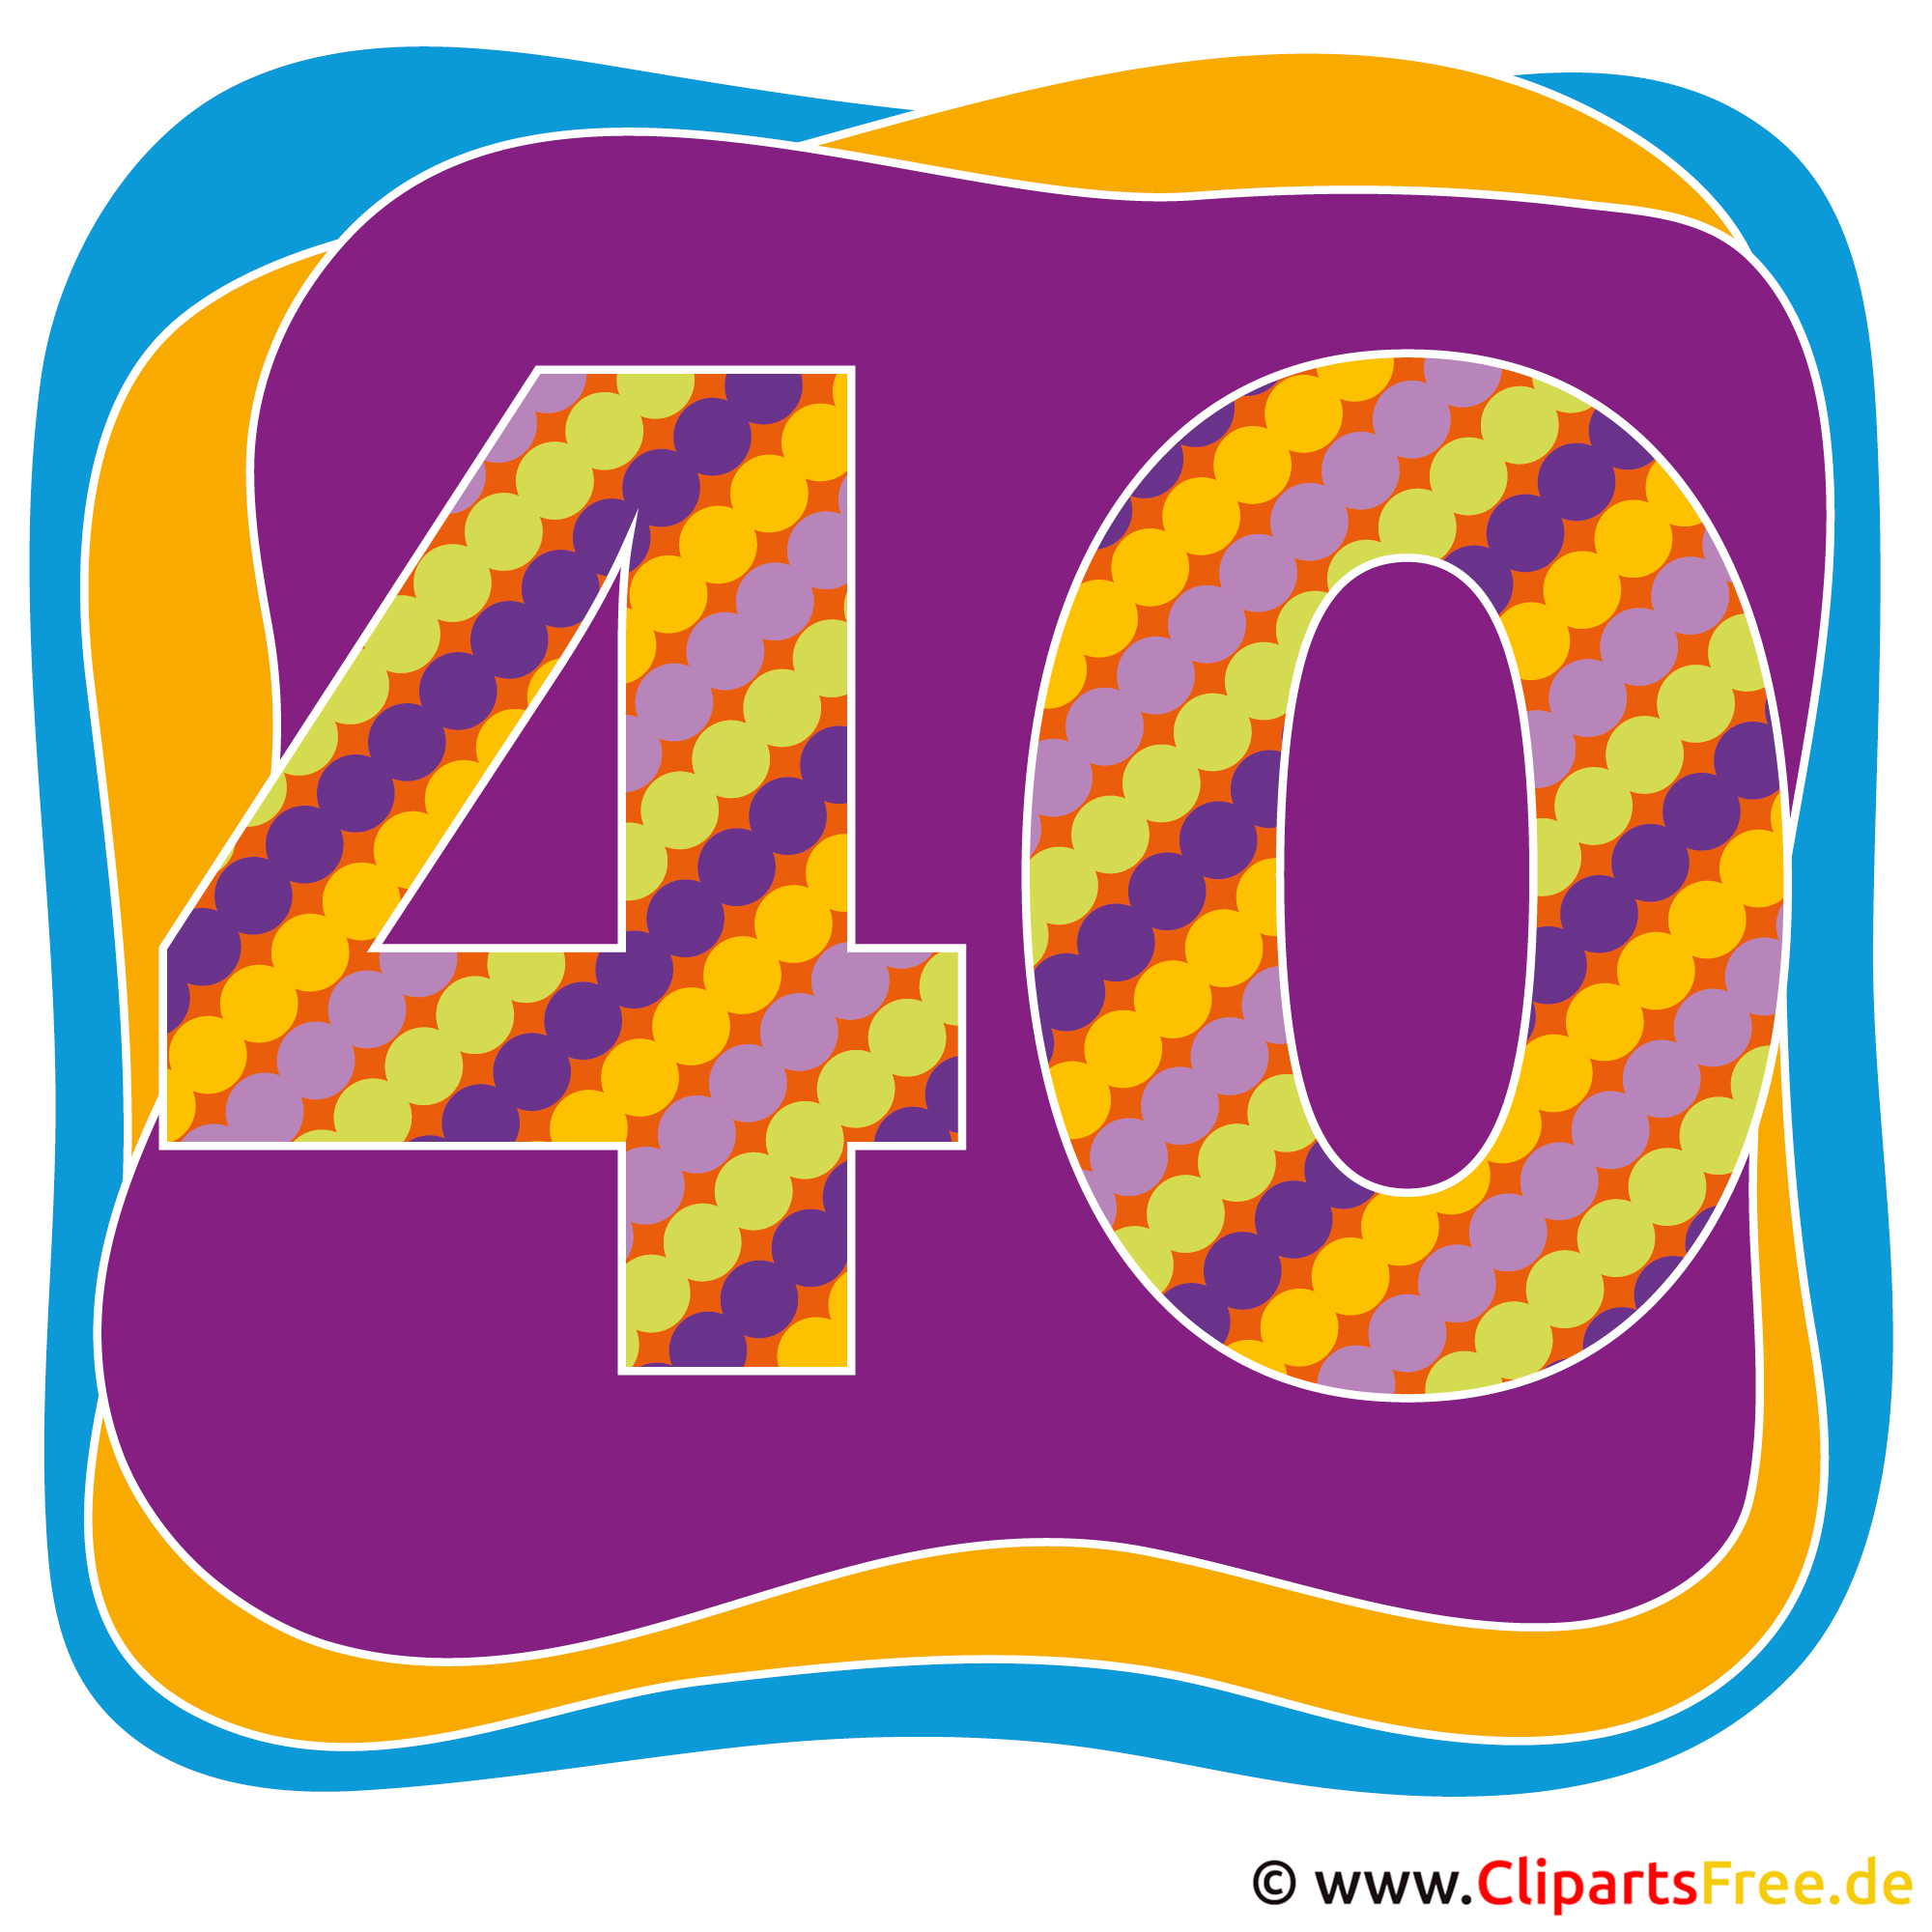 40 Jahre Party Bild, Clipart